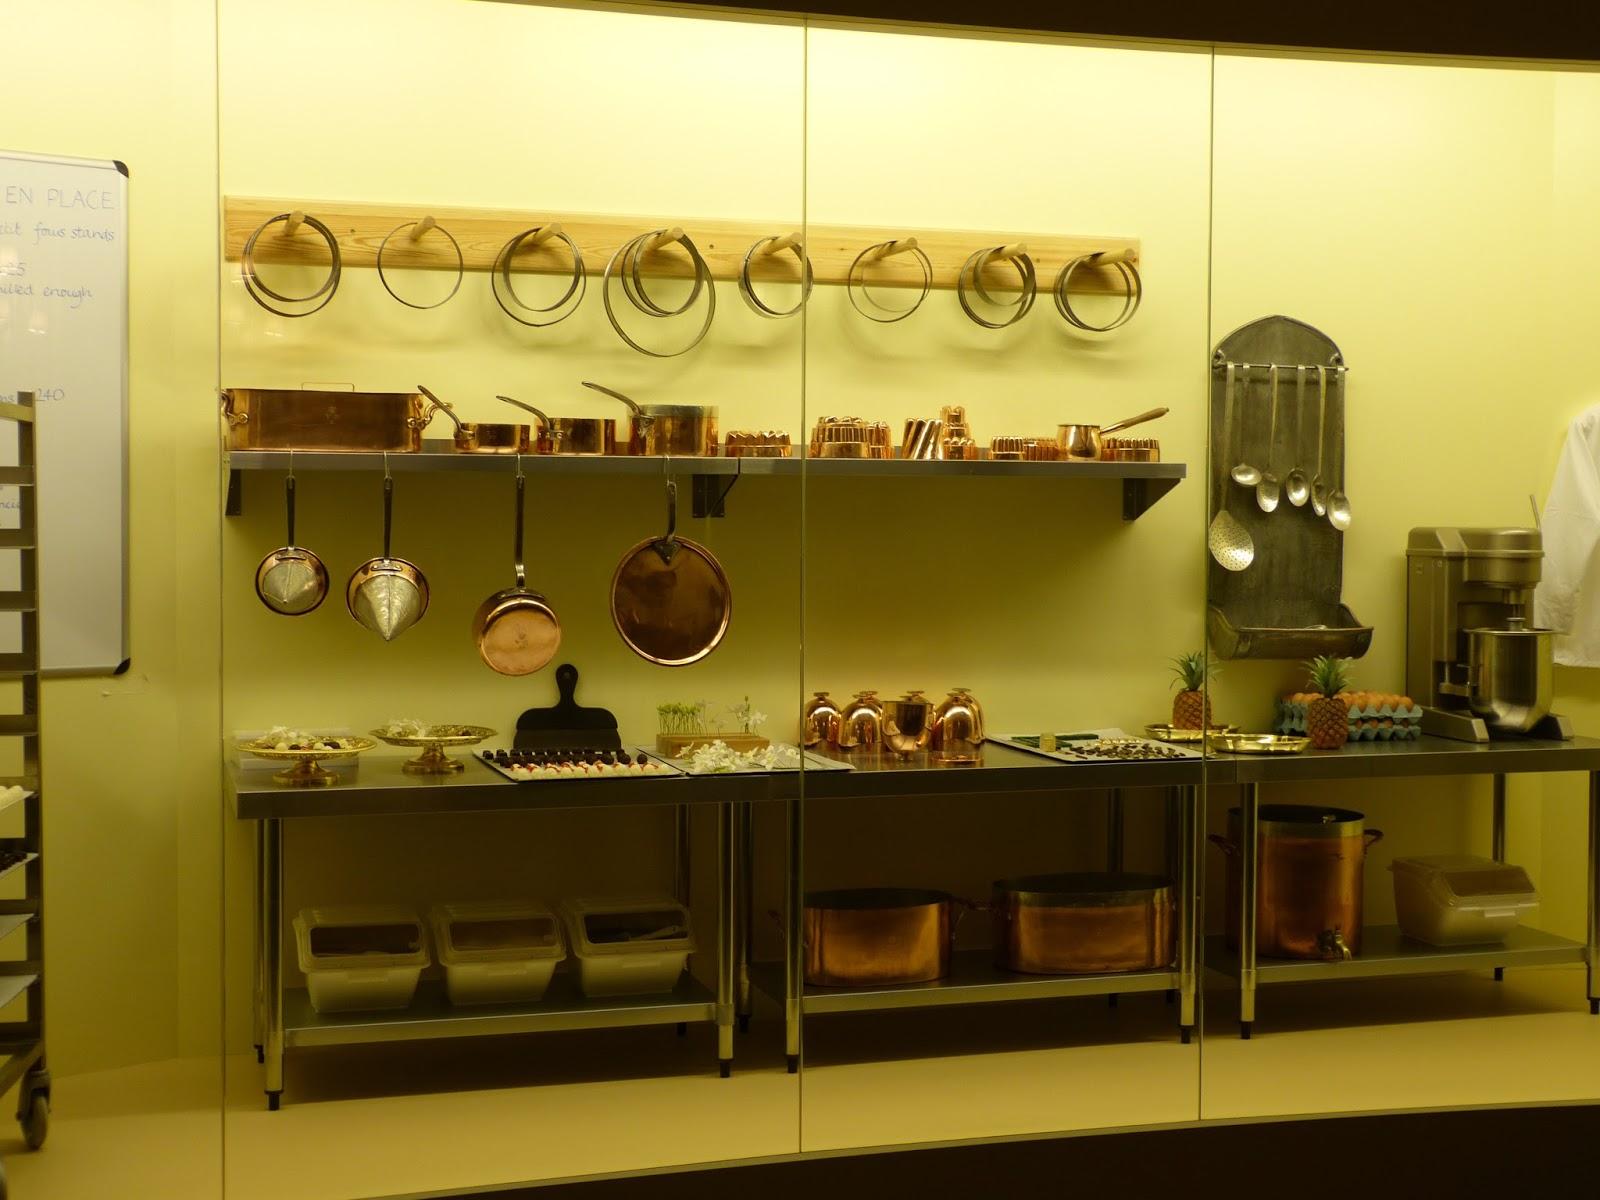 Kitchen Display Royal Welcome 2015 Exhibition Buckingham